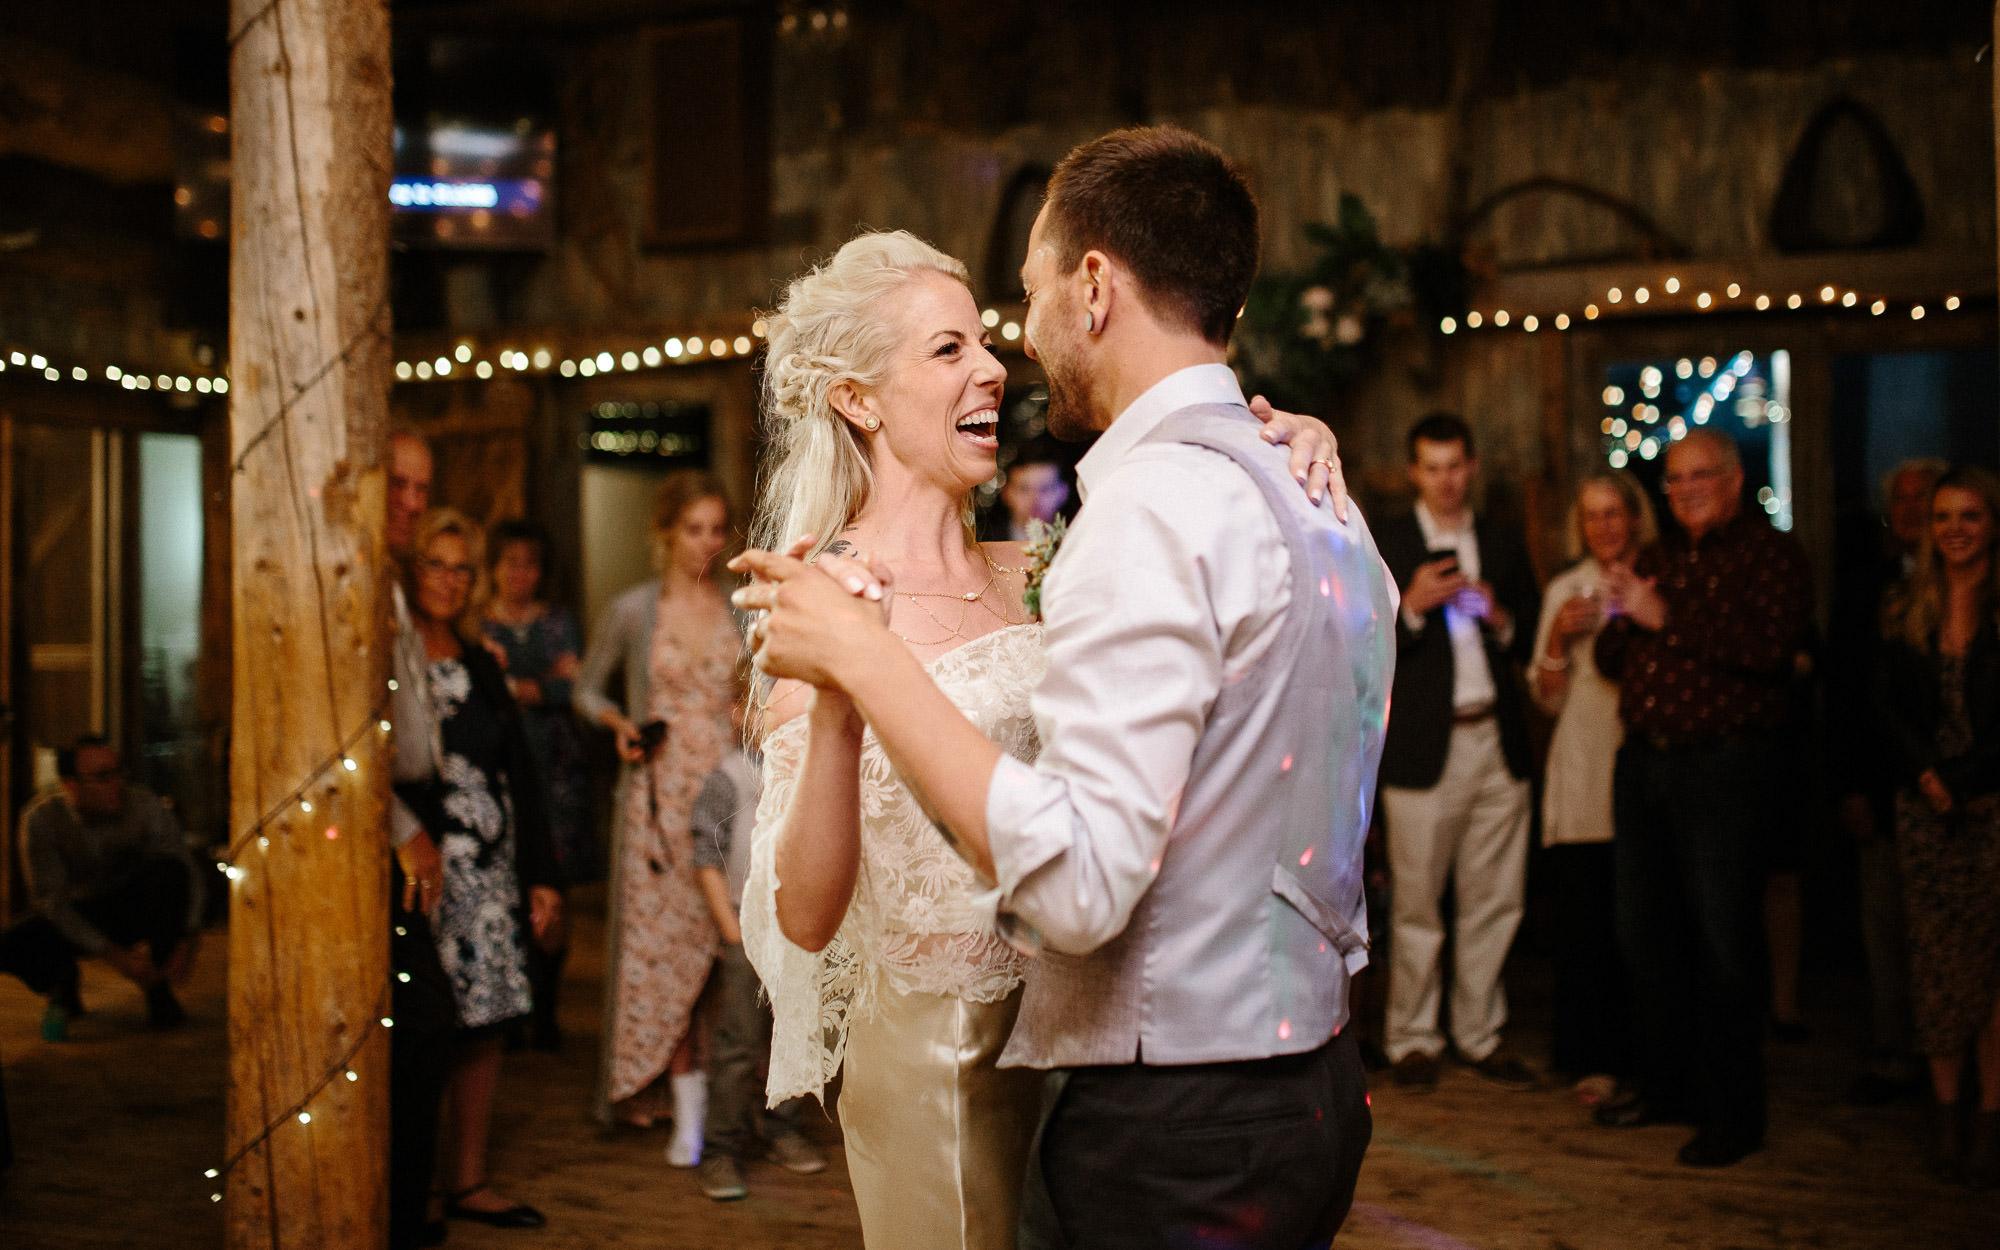 bucci-barn-wedding-elopement-evergreen-boulder-denver-colorado-adventerous-romantic-timeless-107.jpg